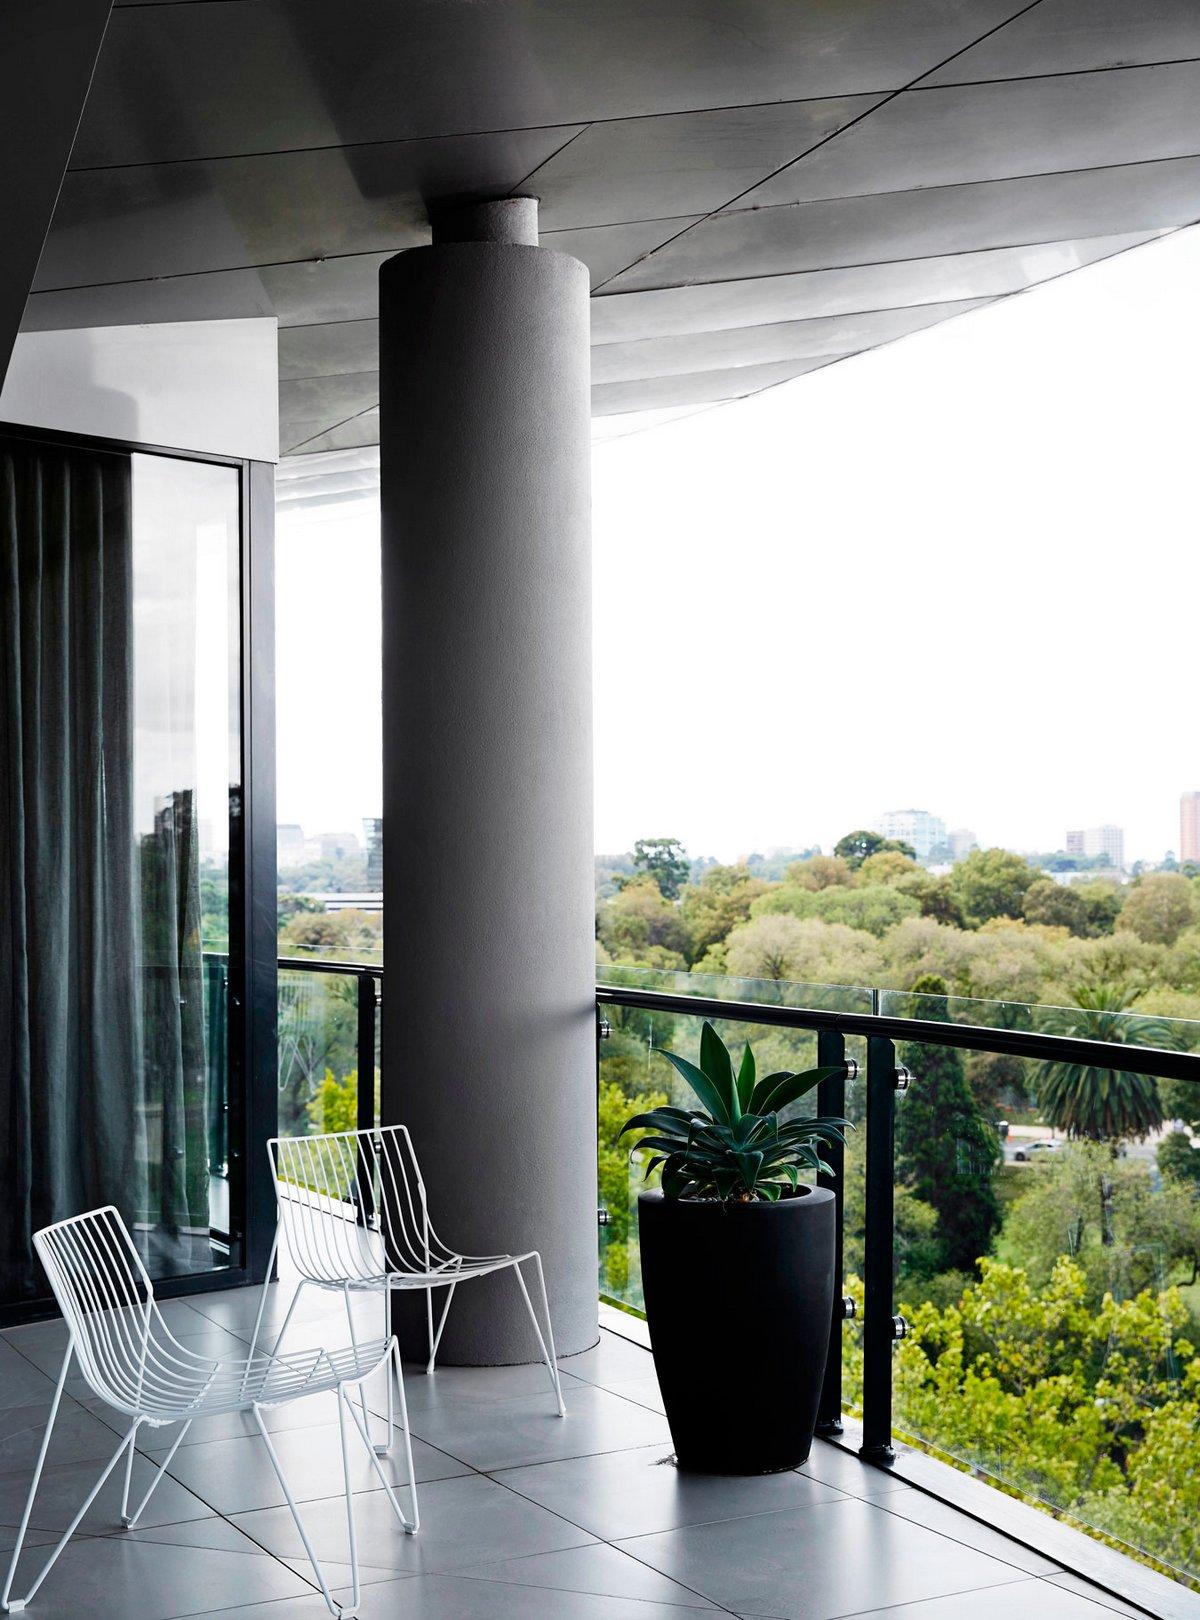 балкон с видом на голливуд